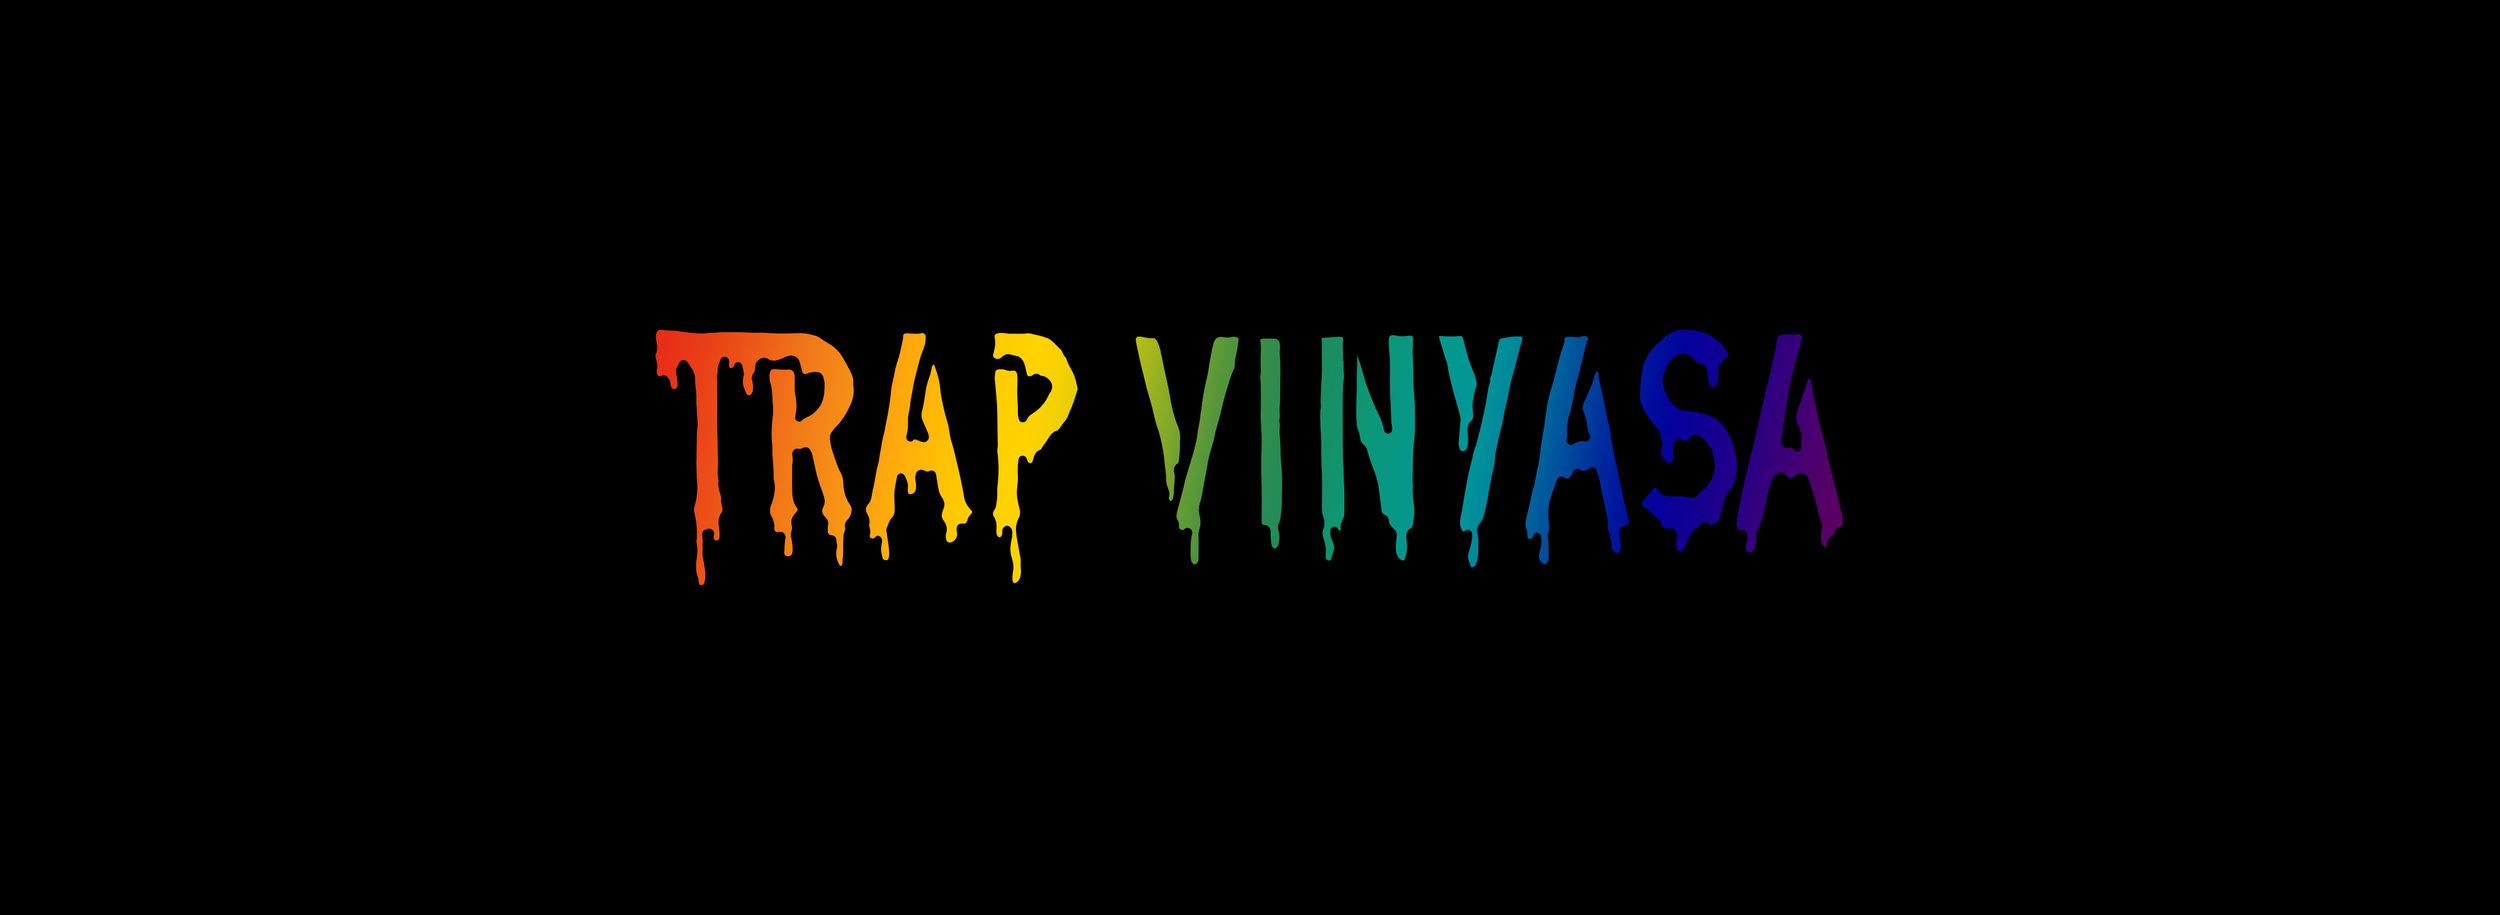 trap-vinyasa-logo-FINAL-black-banner.jpg